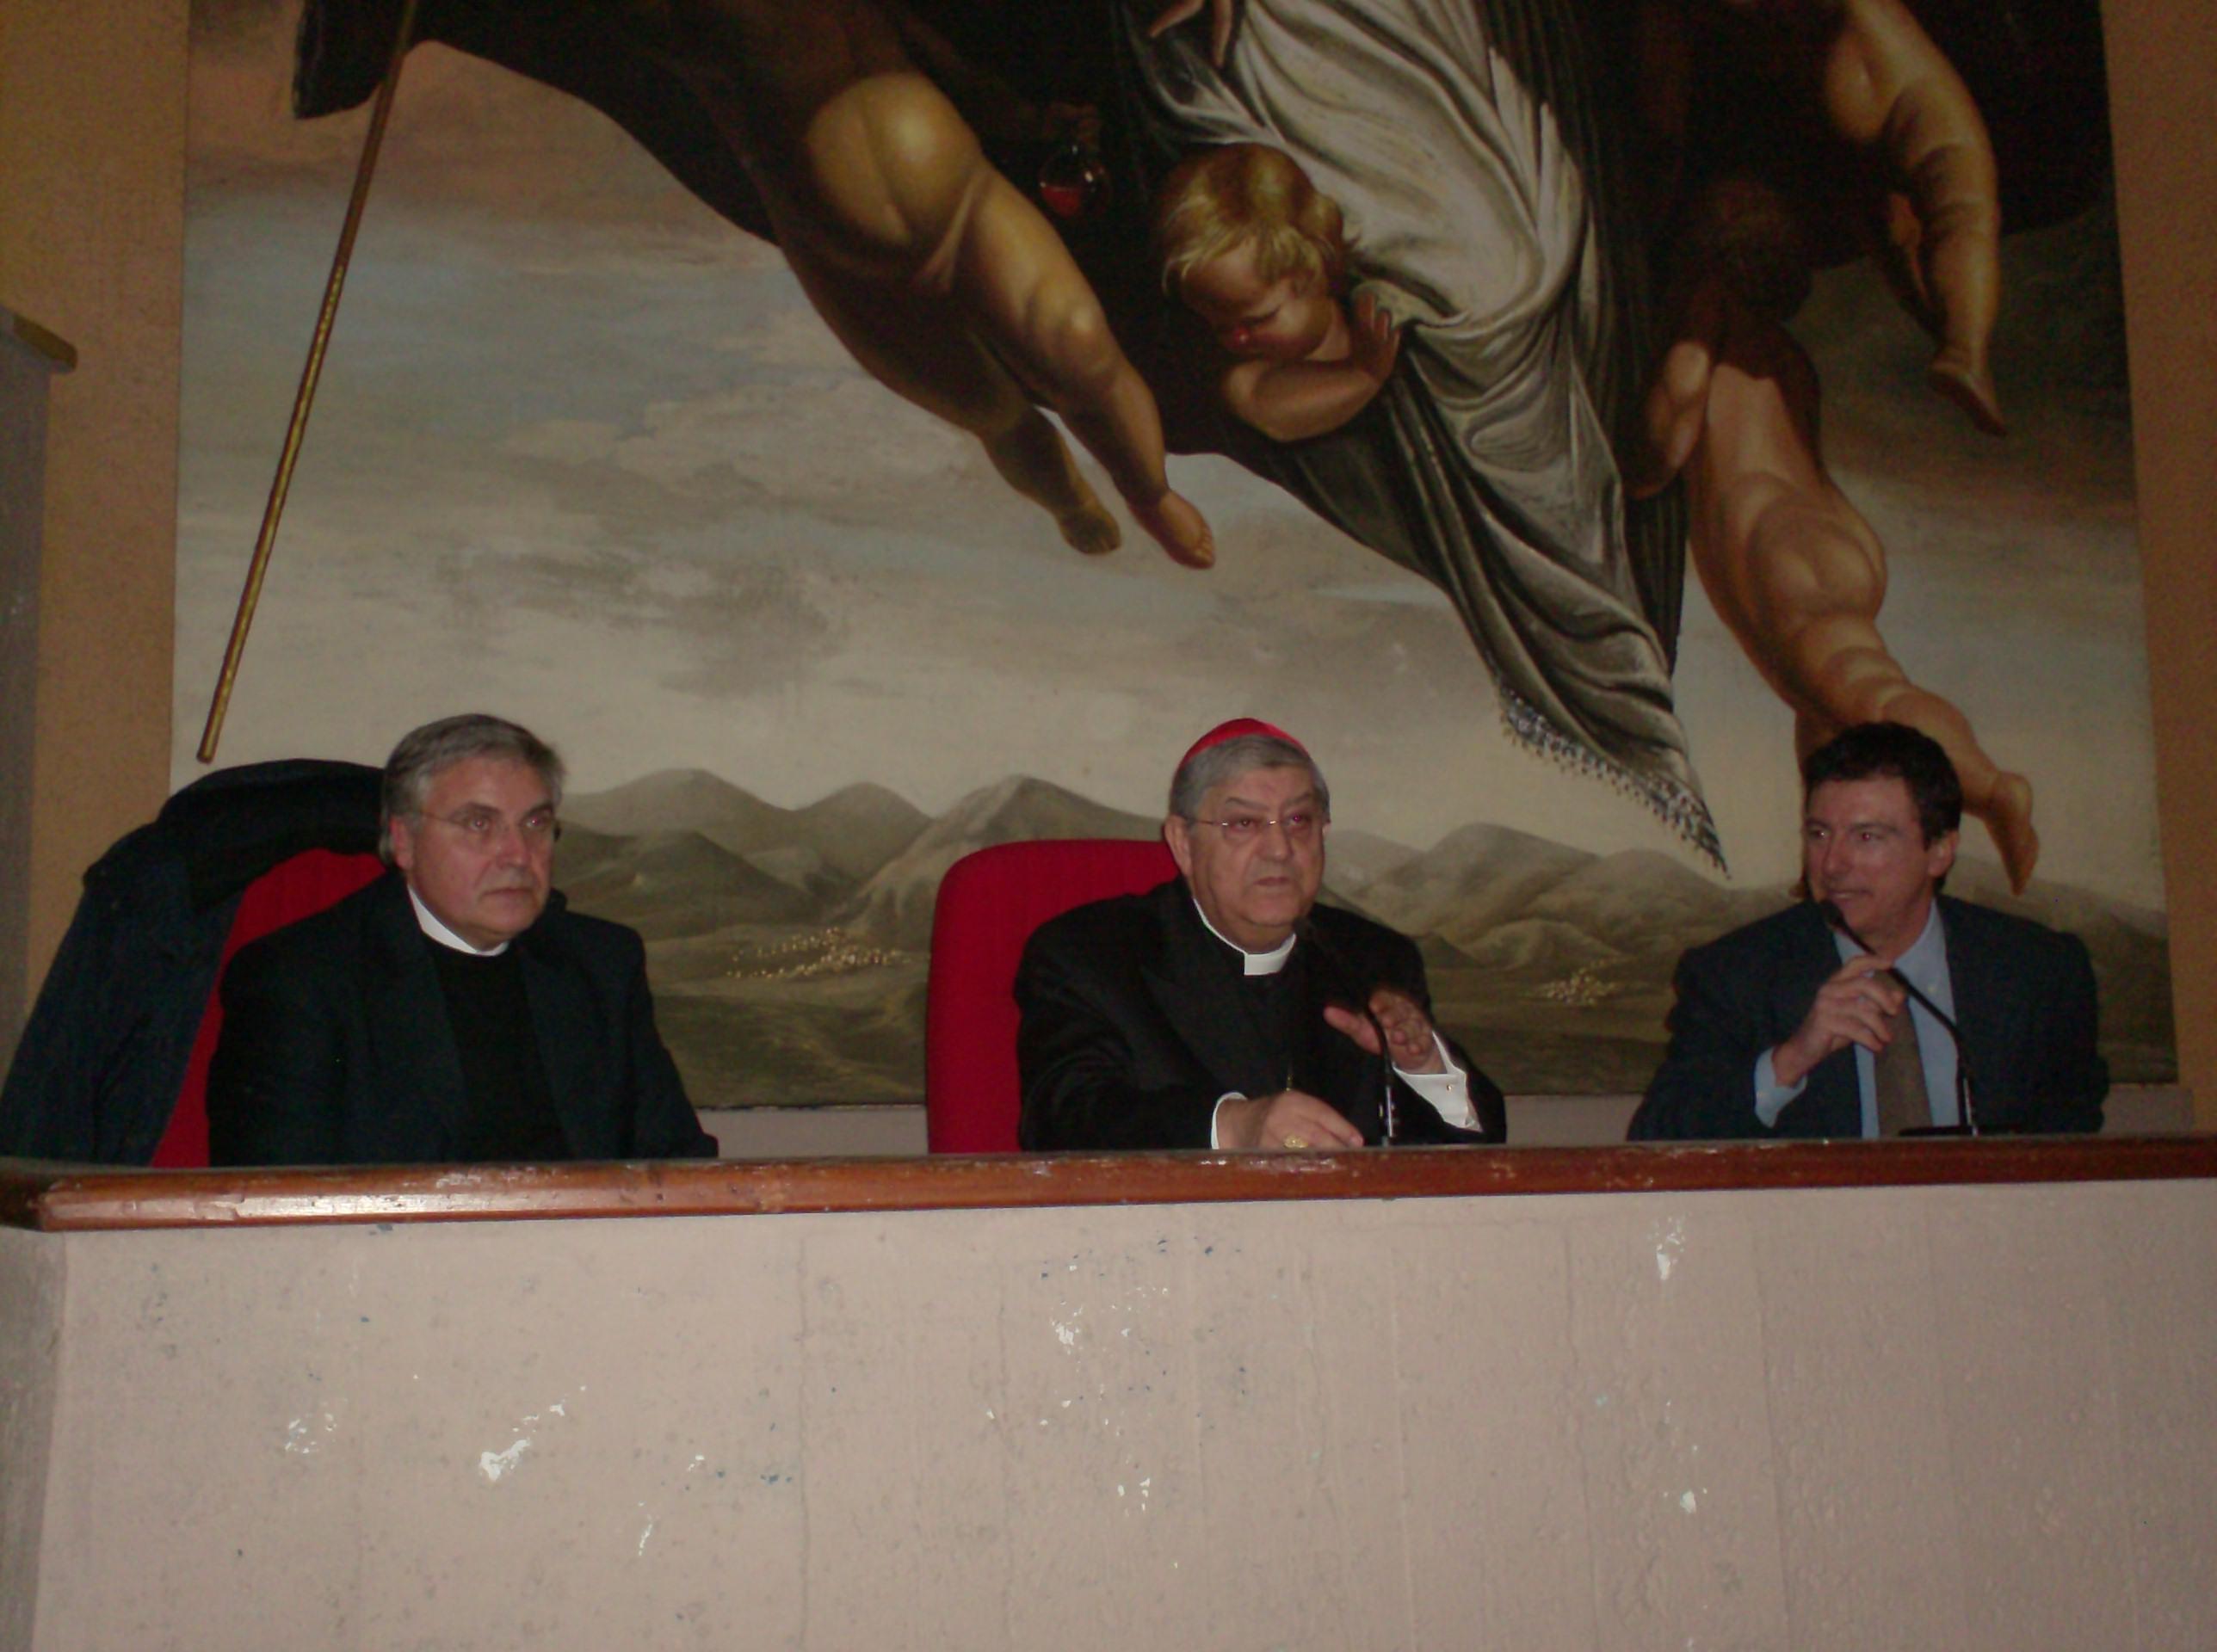 Don Tonino Palmese S.E. Card. Crescenzio Sepe Pres.te OdG Ottavio Lucarelli Napoli